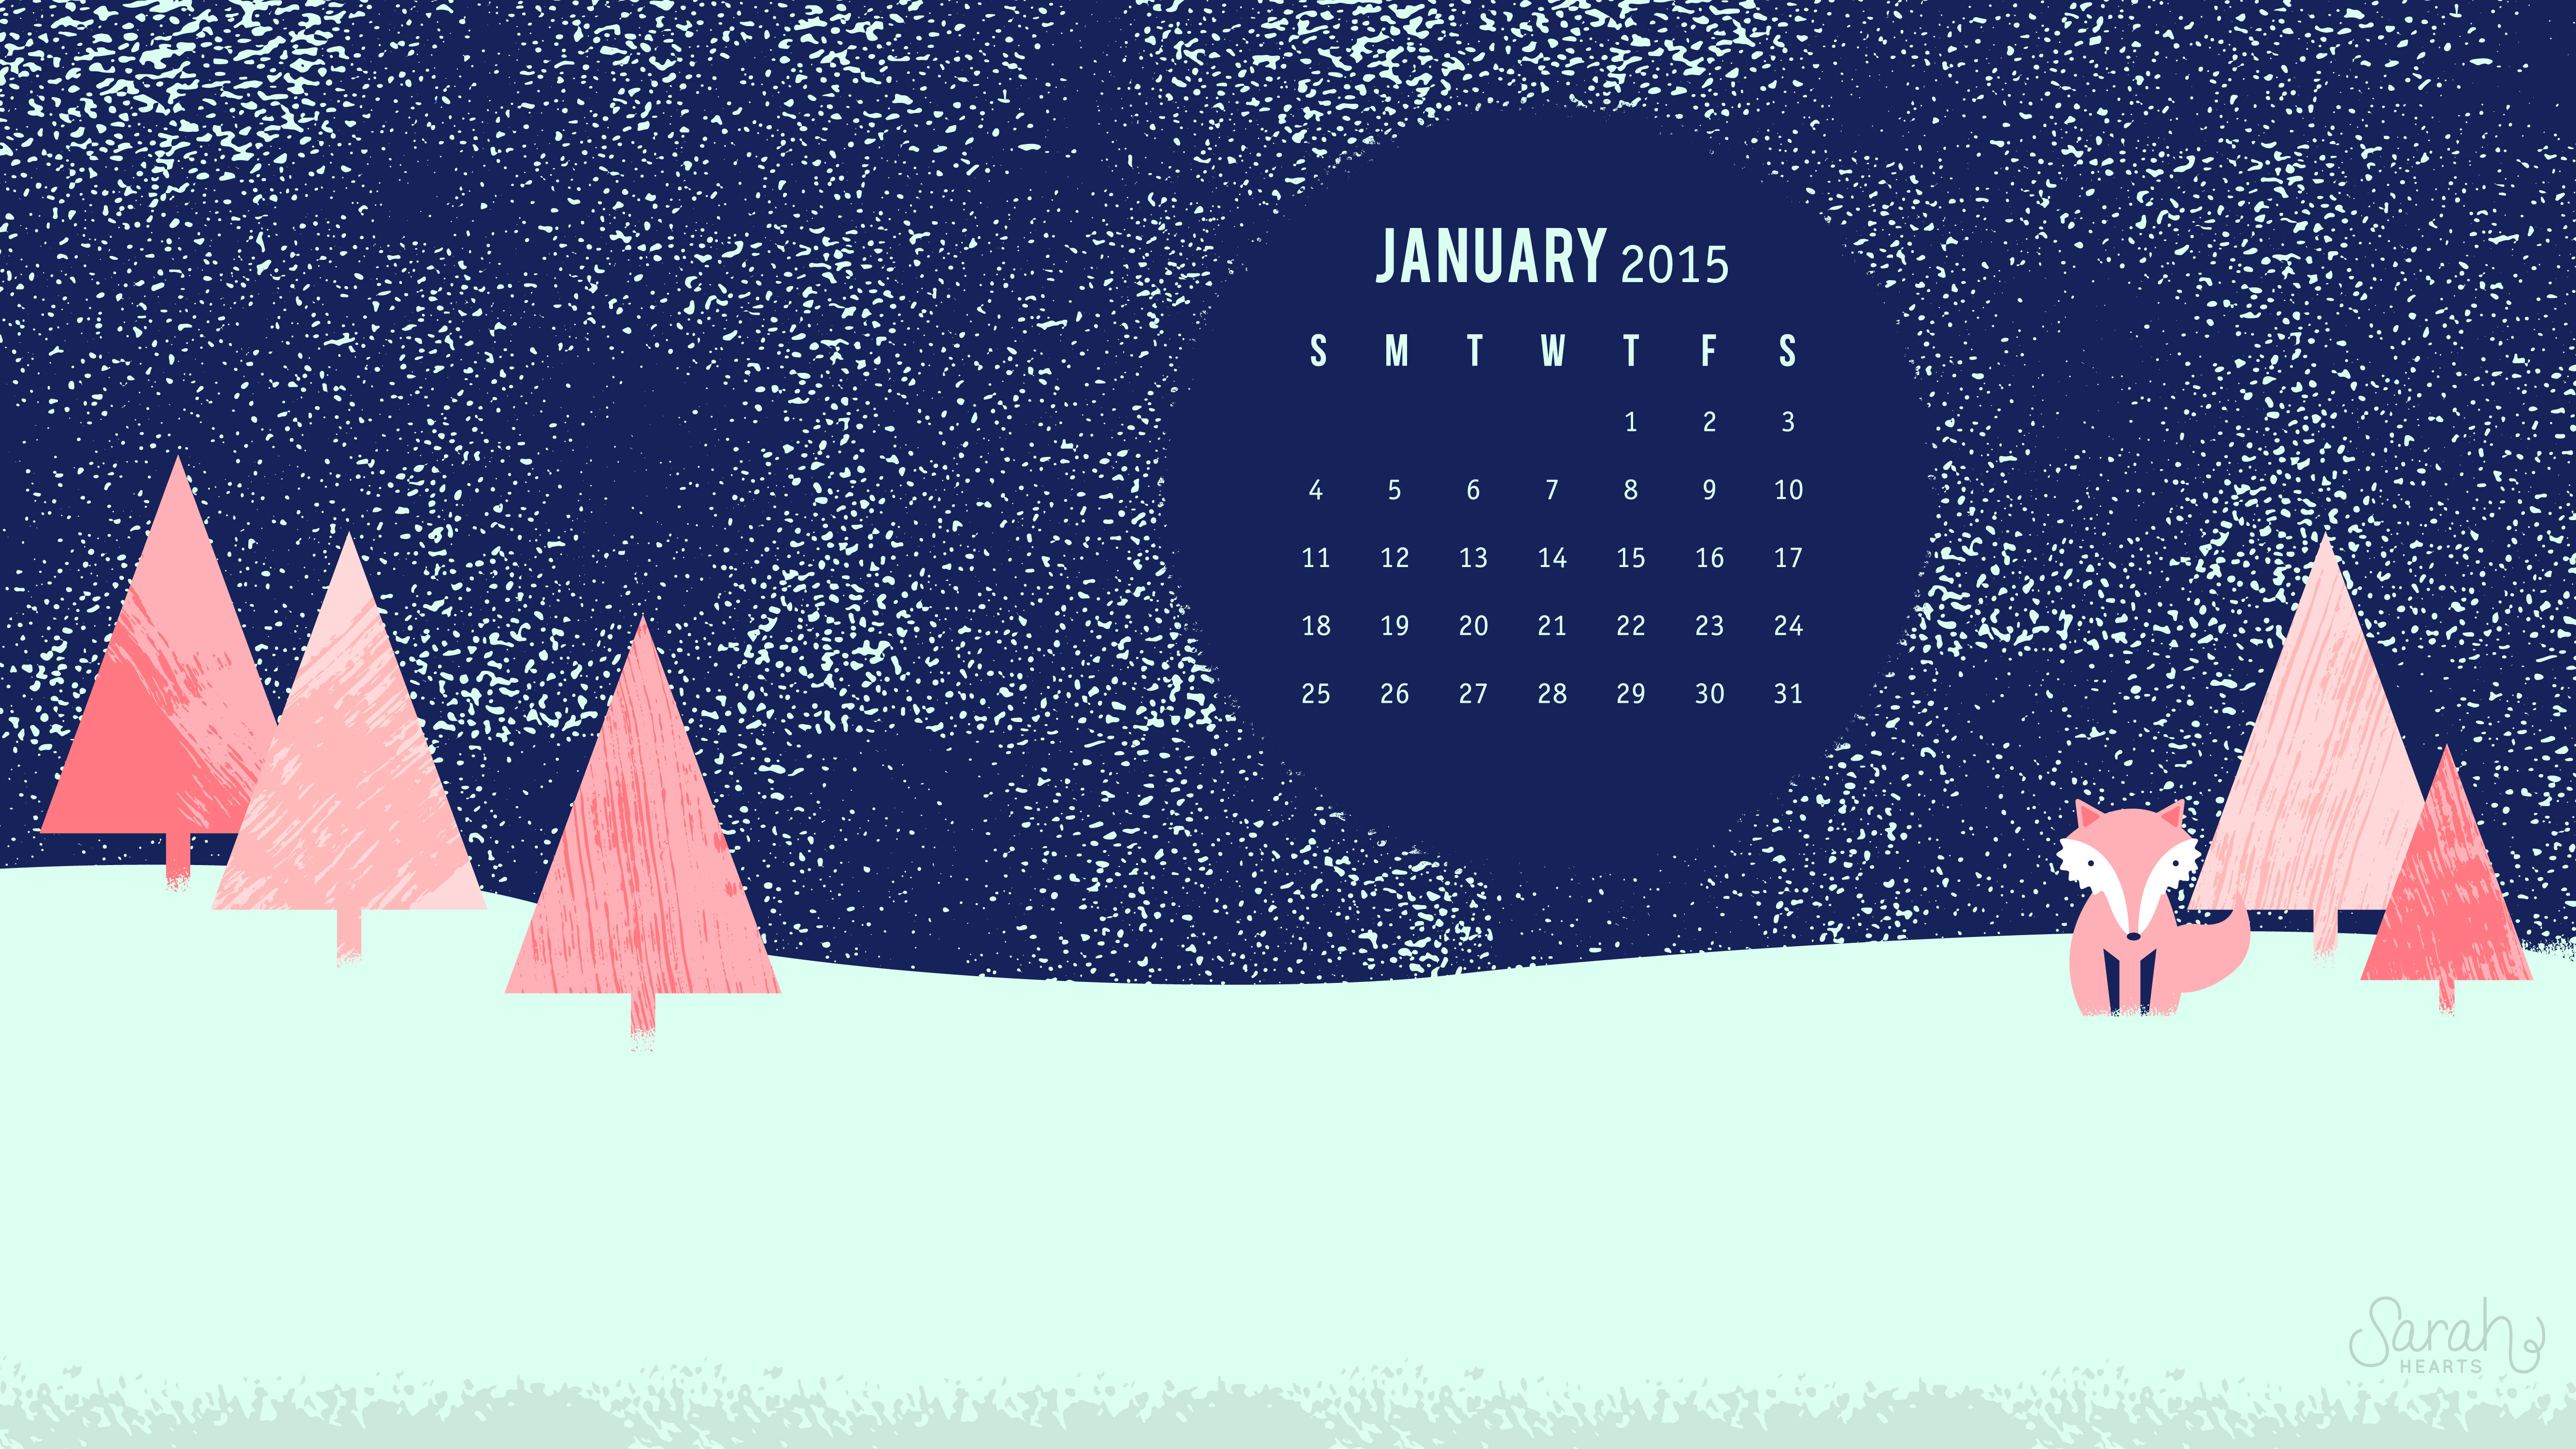 january 2015 calendar wallpaper